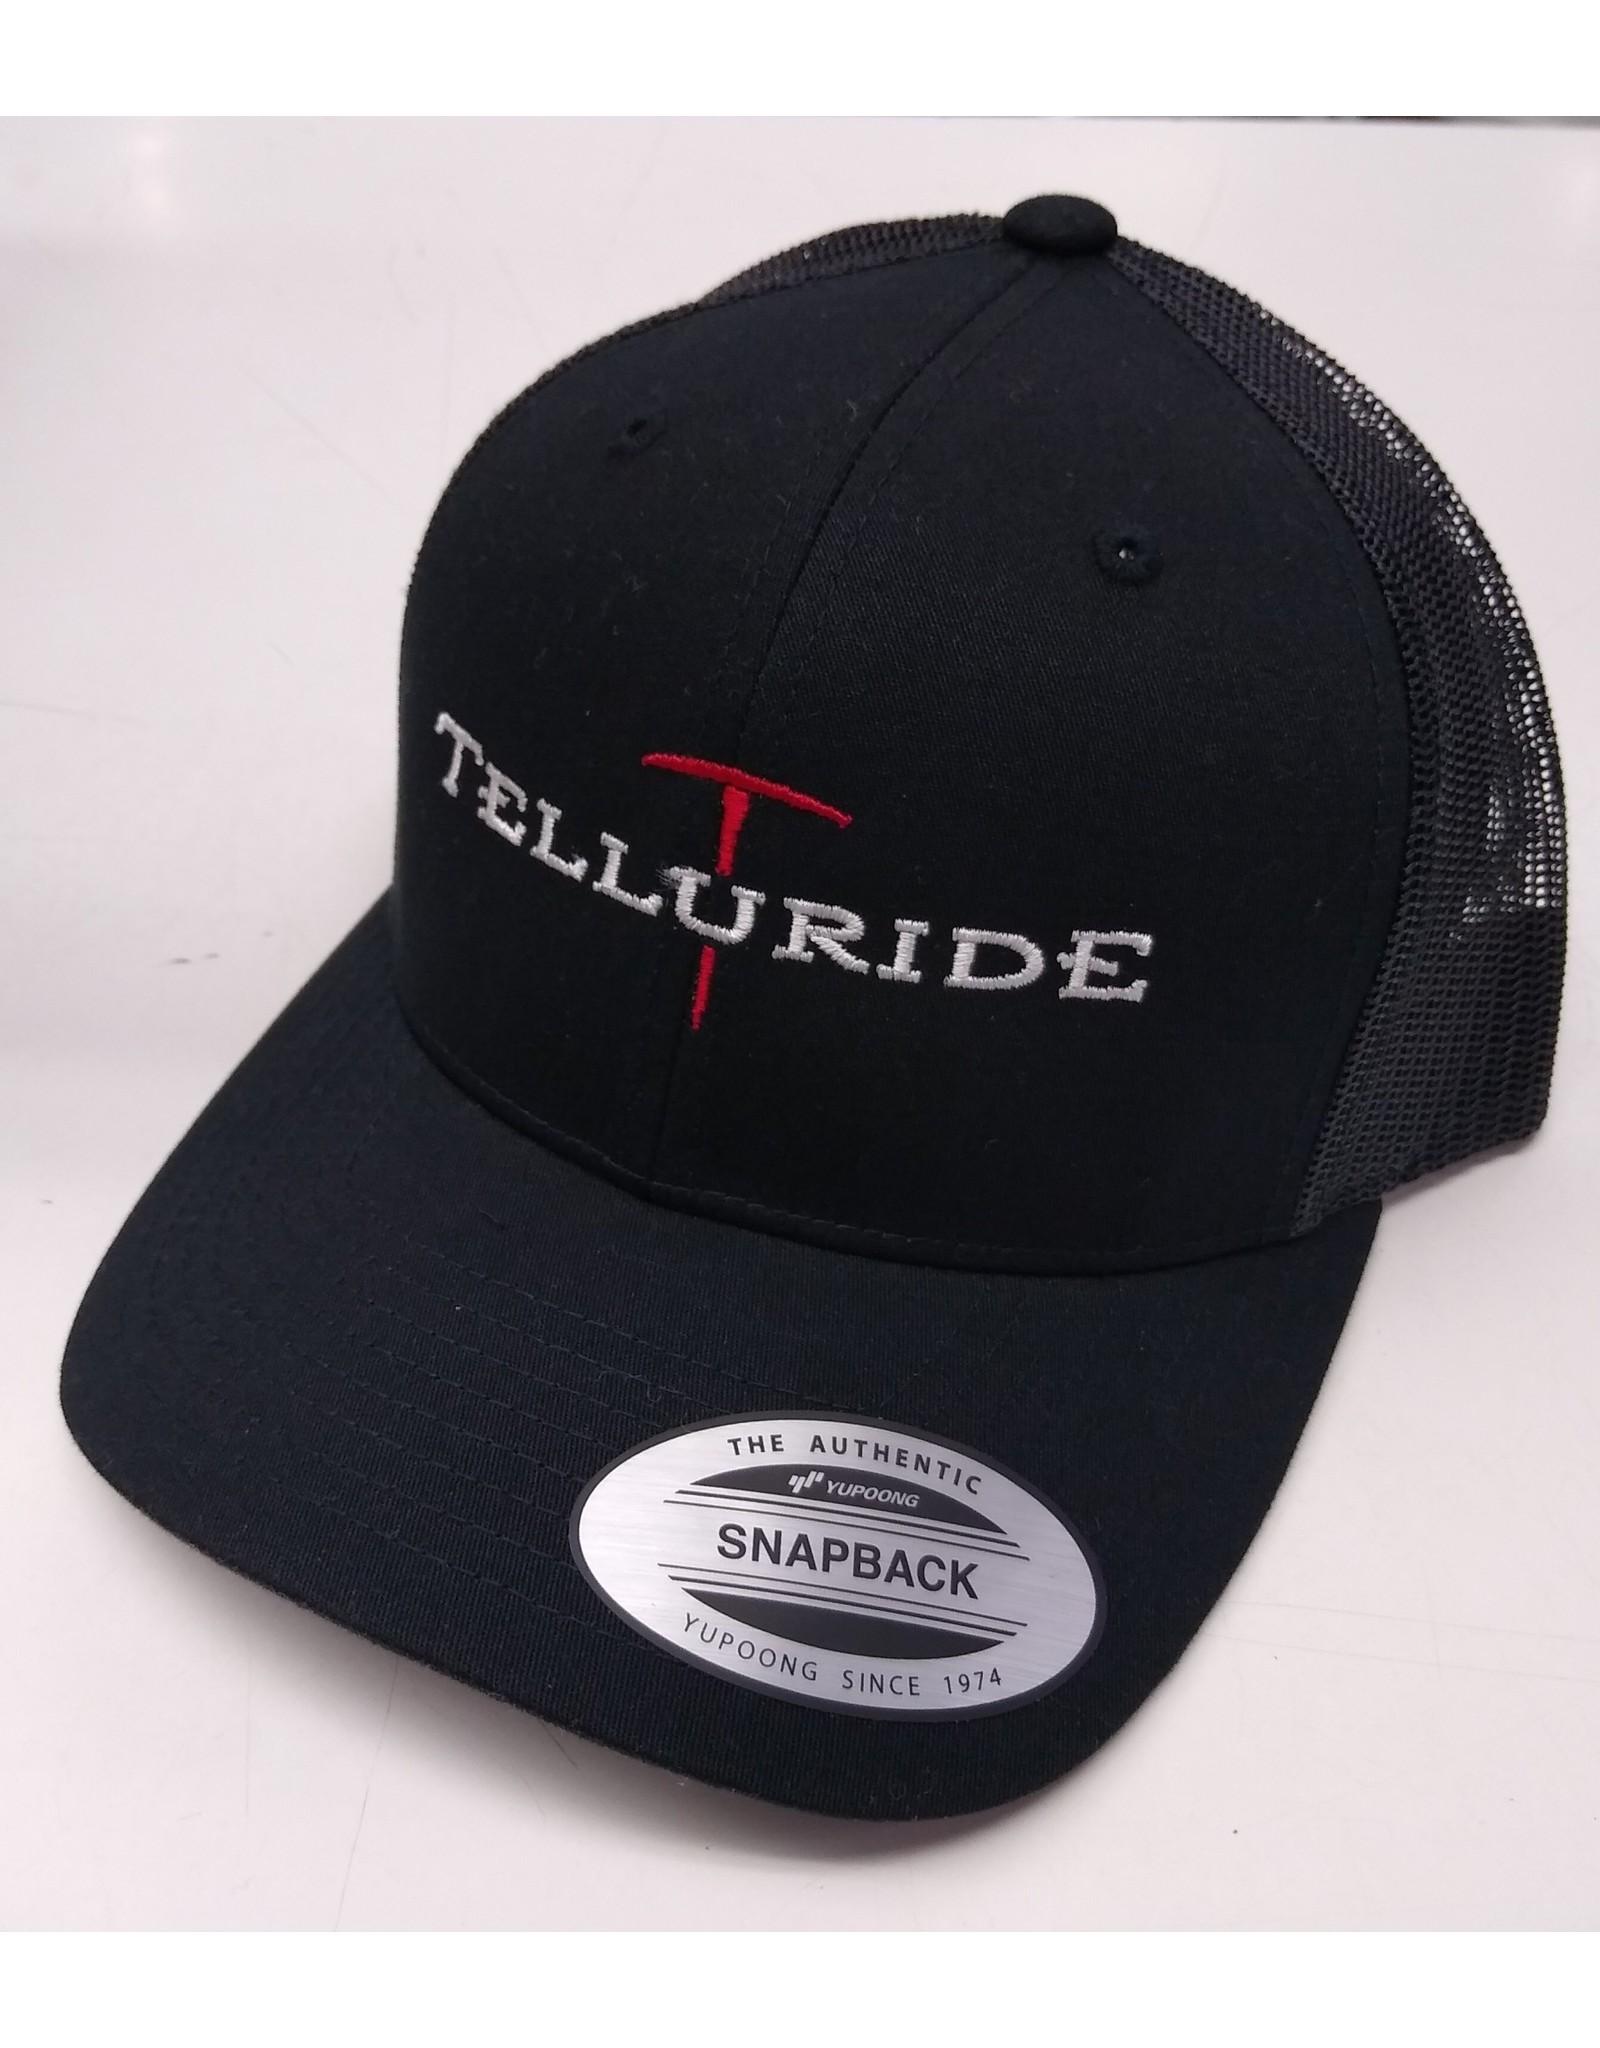 4IMPRINT YUPOONG TRUCKER HAT BLACK 136730 PICK AXE